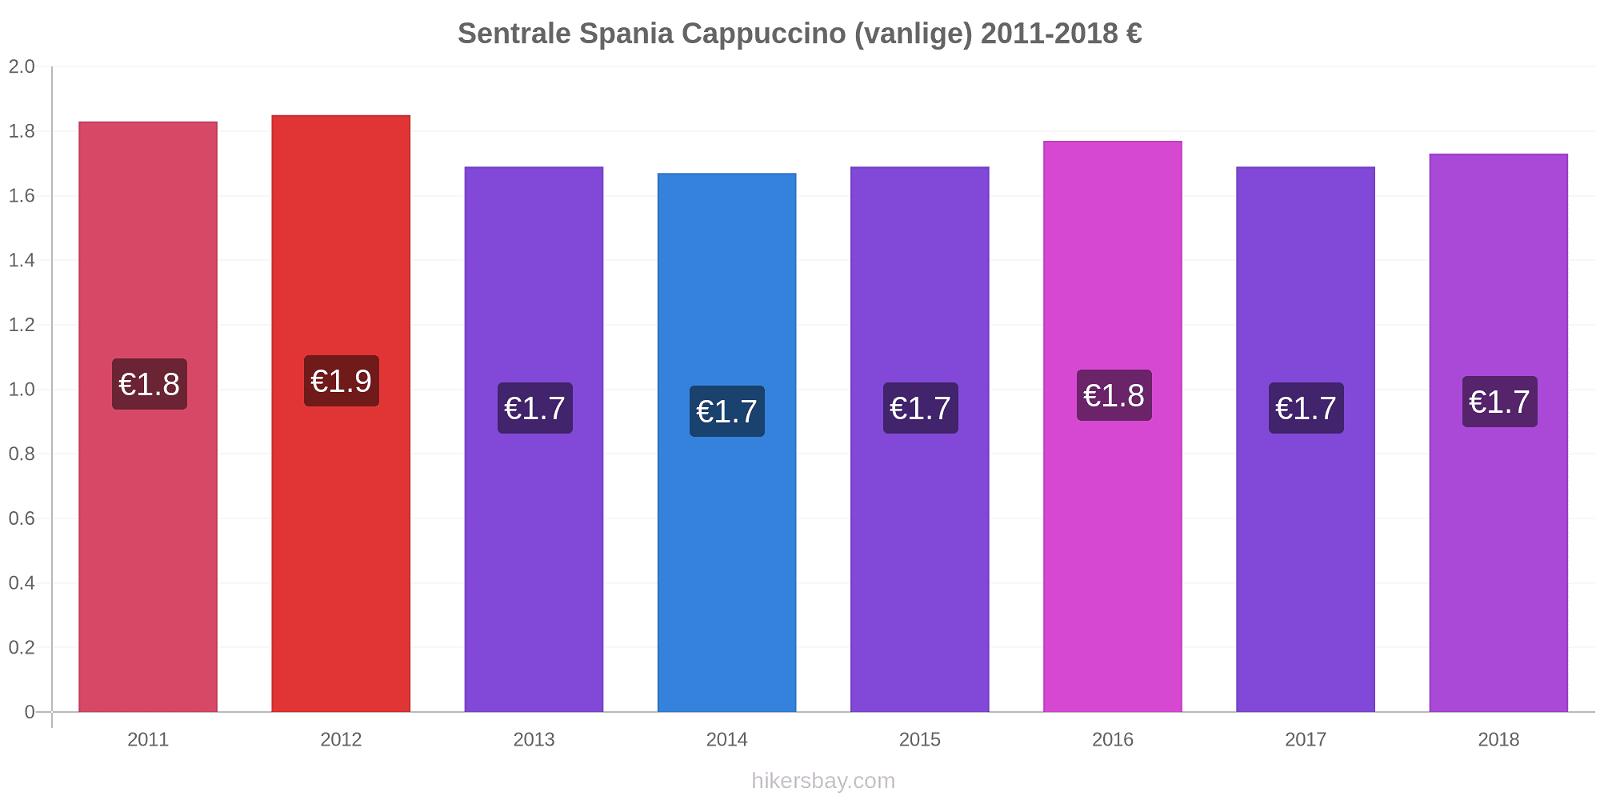 Sentrale Spania prisendringer Cappuccino (vanlige) hikersbay.com